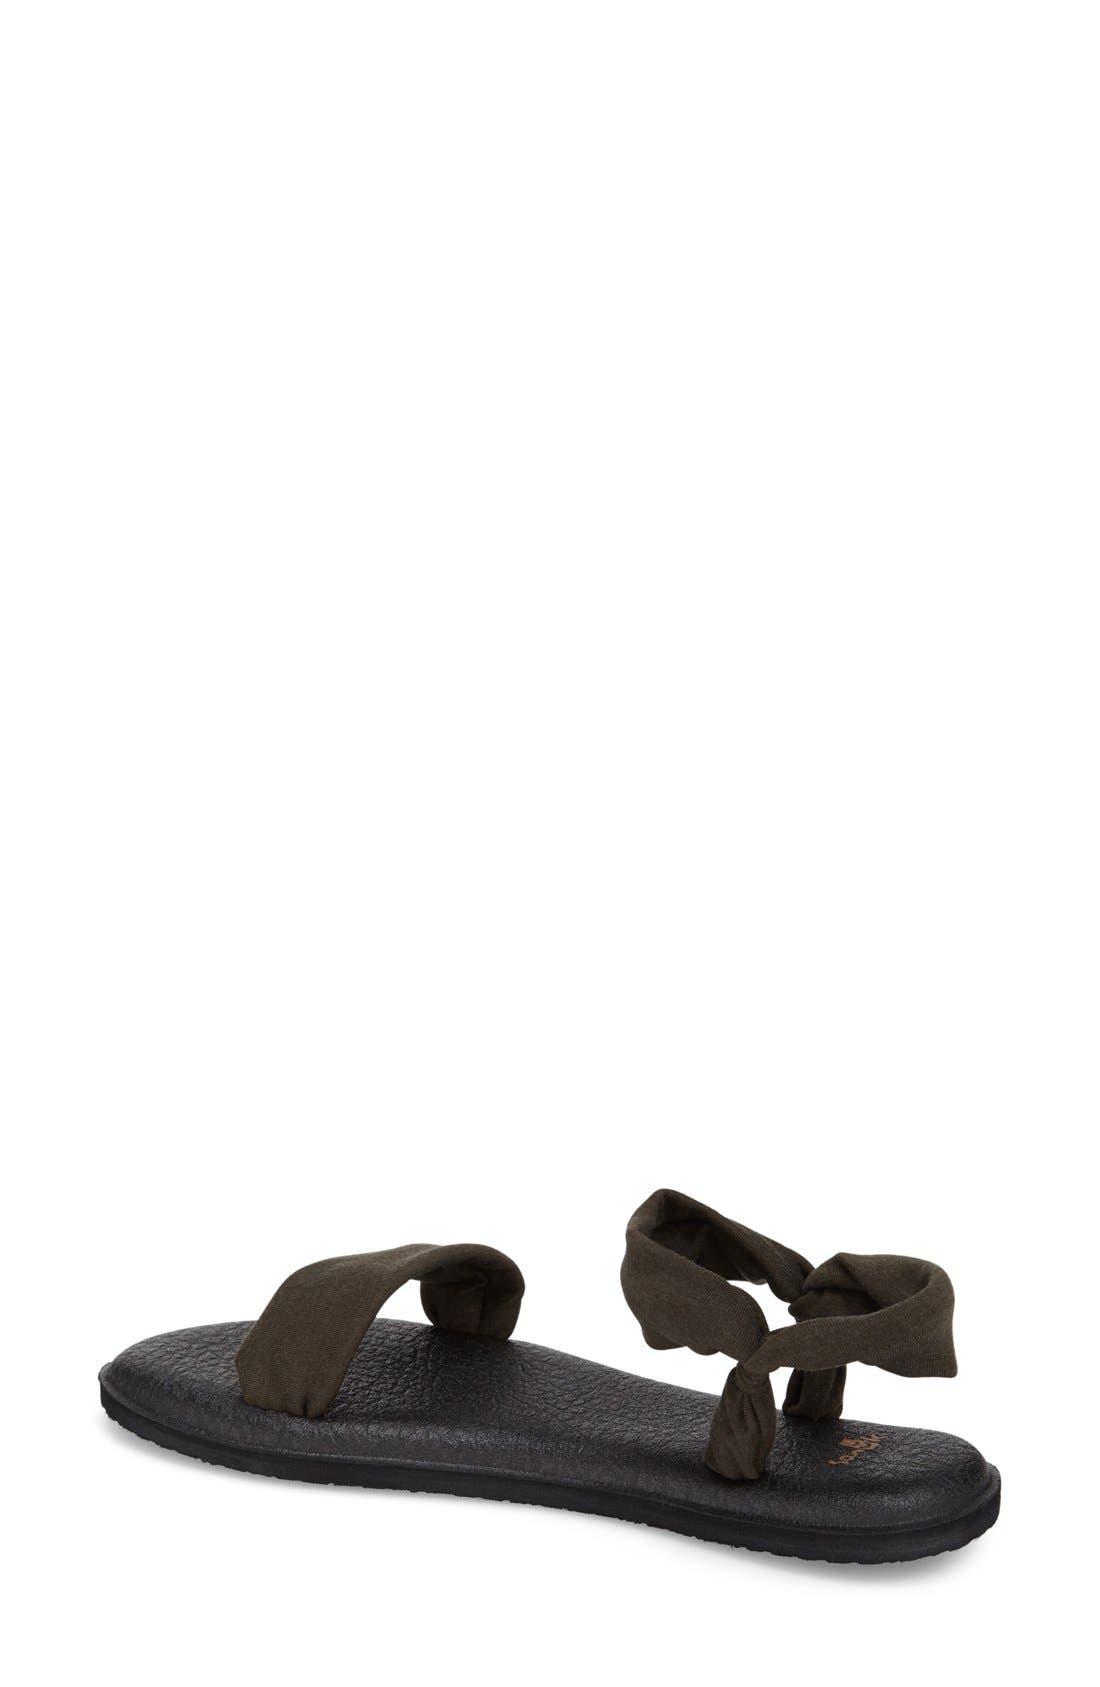 Alternate Image 2  - Sanuk 'Yoga Duet' Double Band Sandal (Women)